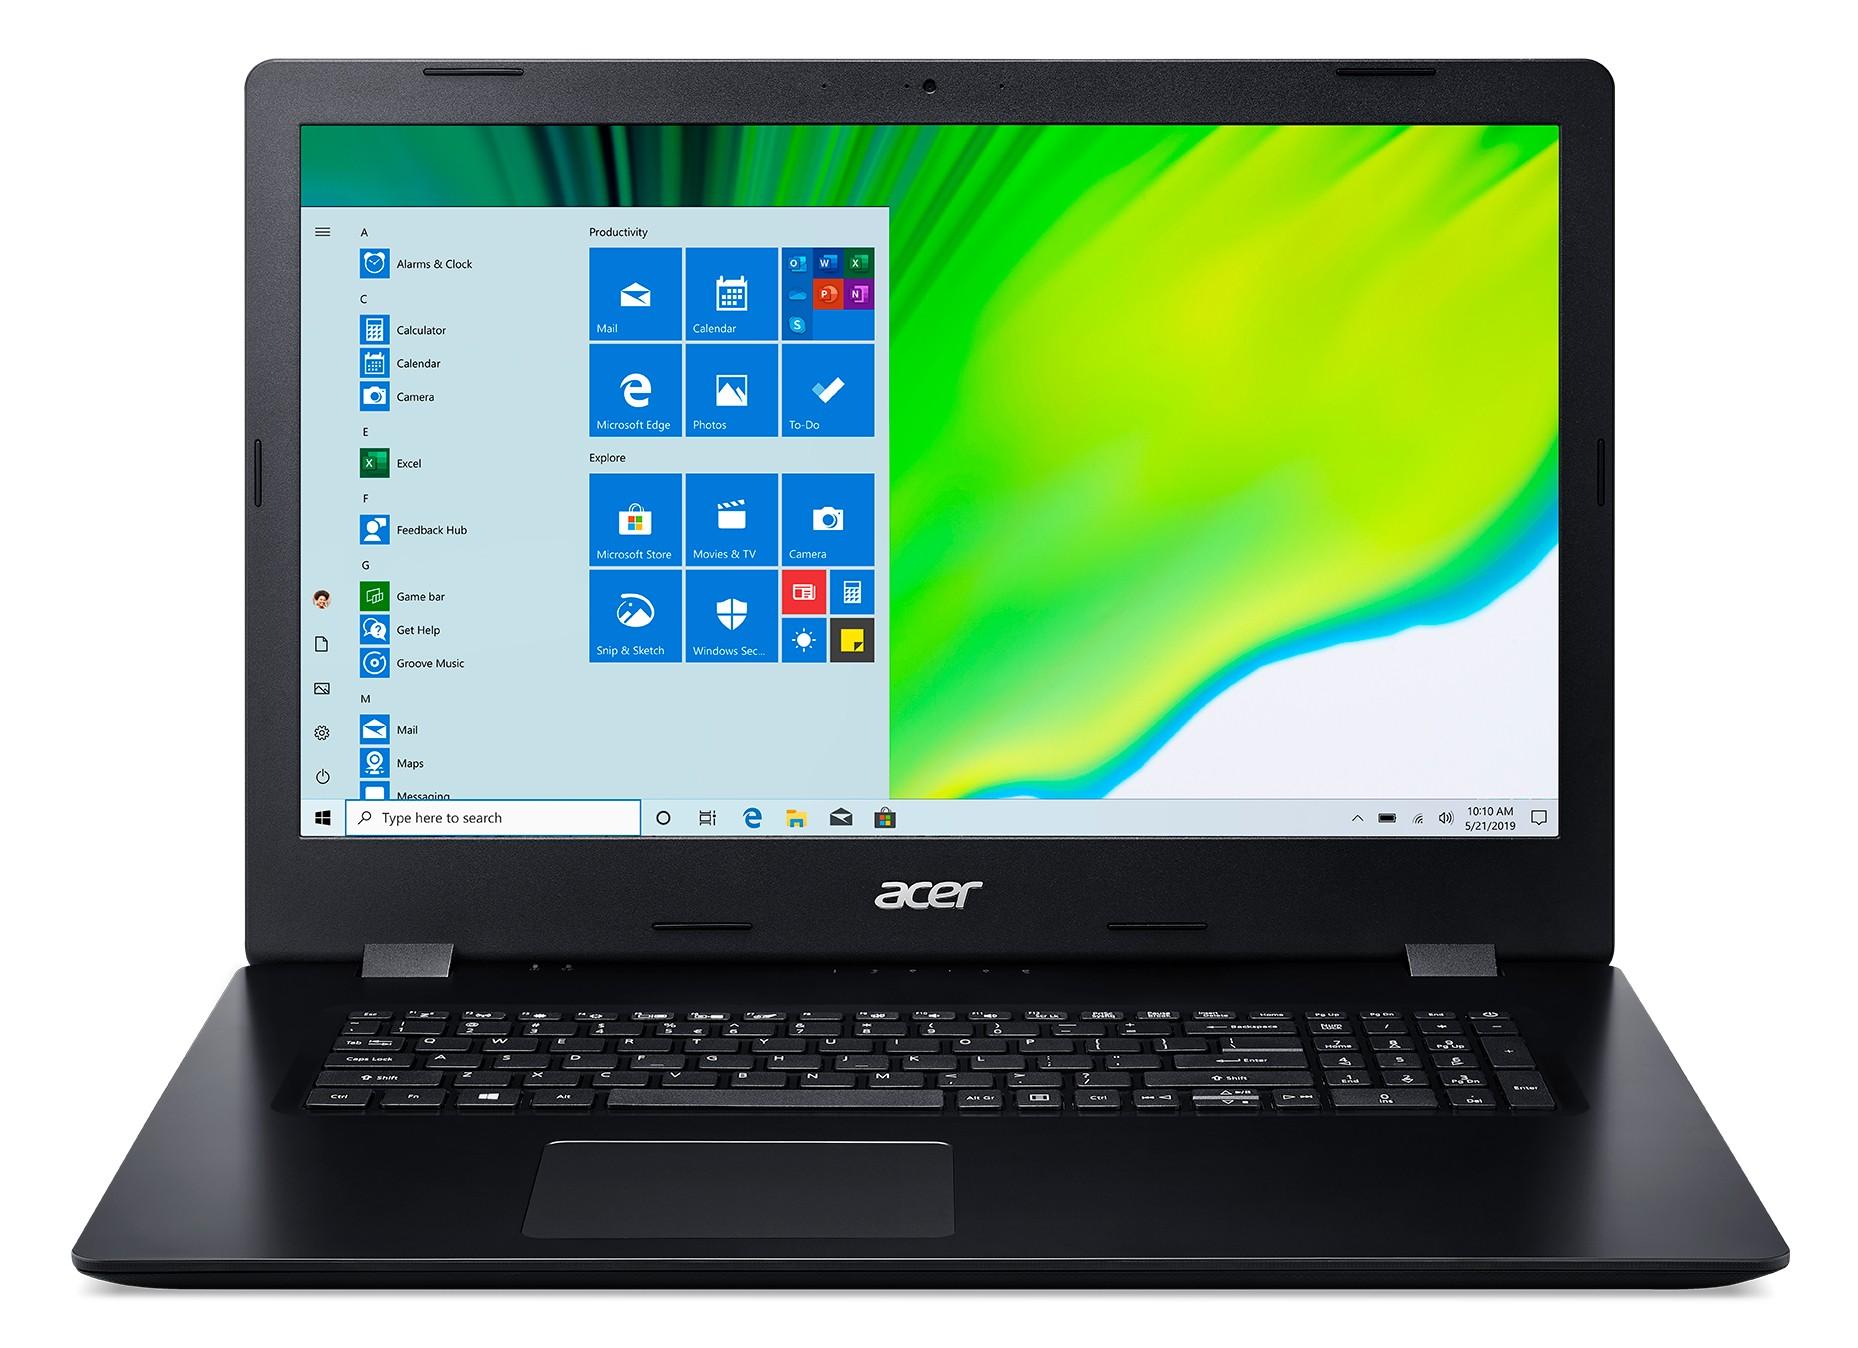 "Acer Aspire 3 A317-52-32T5 Notebook 43,9 cm (17.3"") 1600 x 900 Pixels Intel® 10de generatie Core™ i3 8 GB DDR4-SDRAM 256 GB SSD Wi-Fi 5 (802.11ac) Windows 10 Pro Zwart"